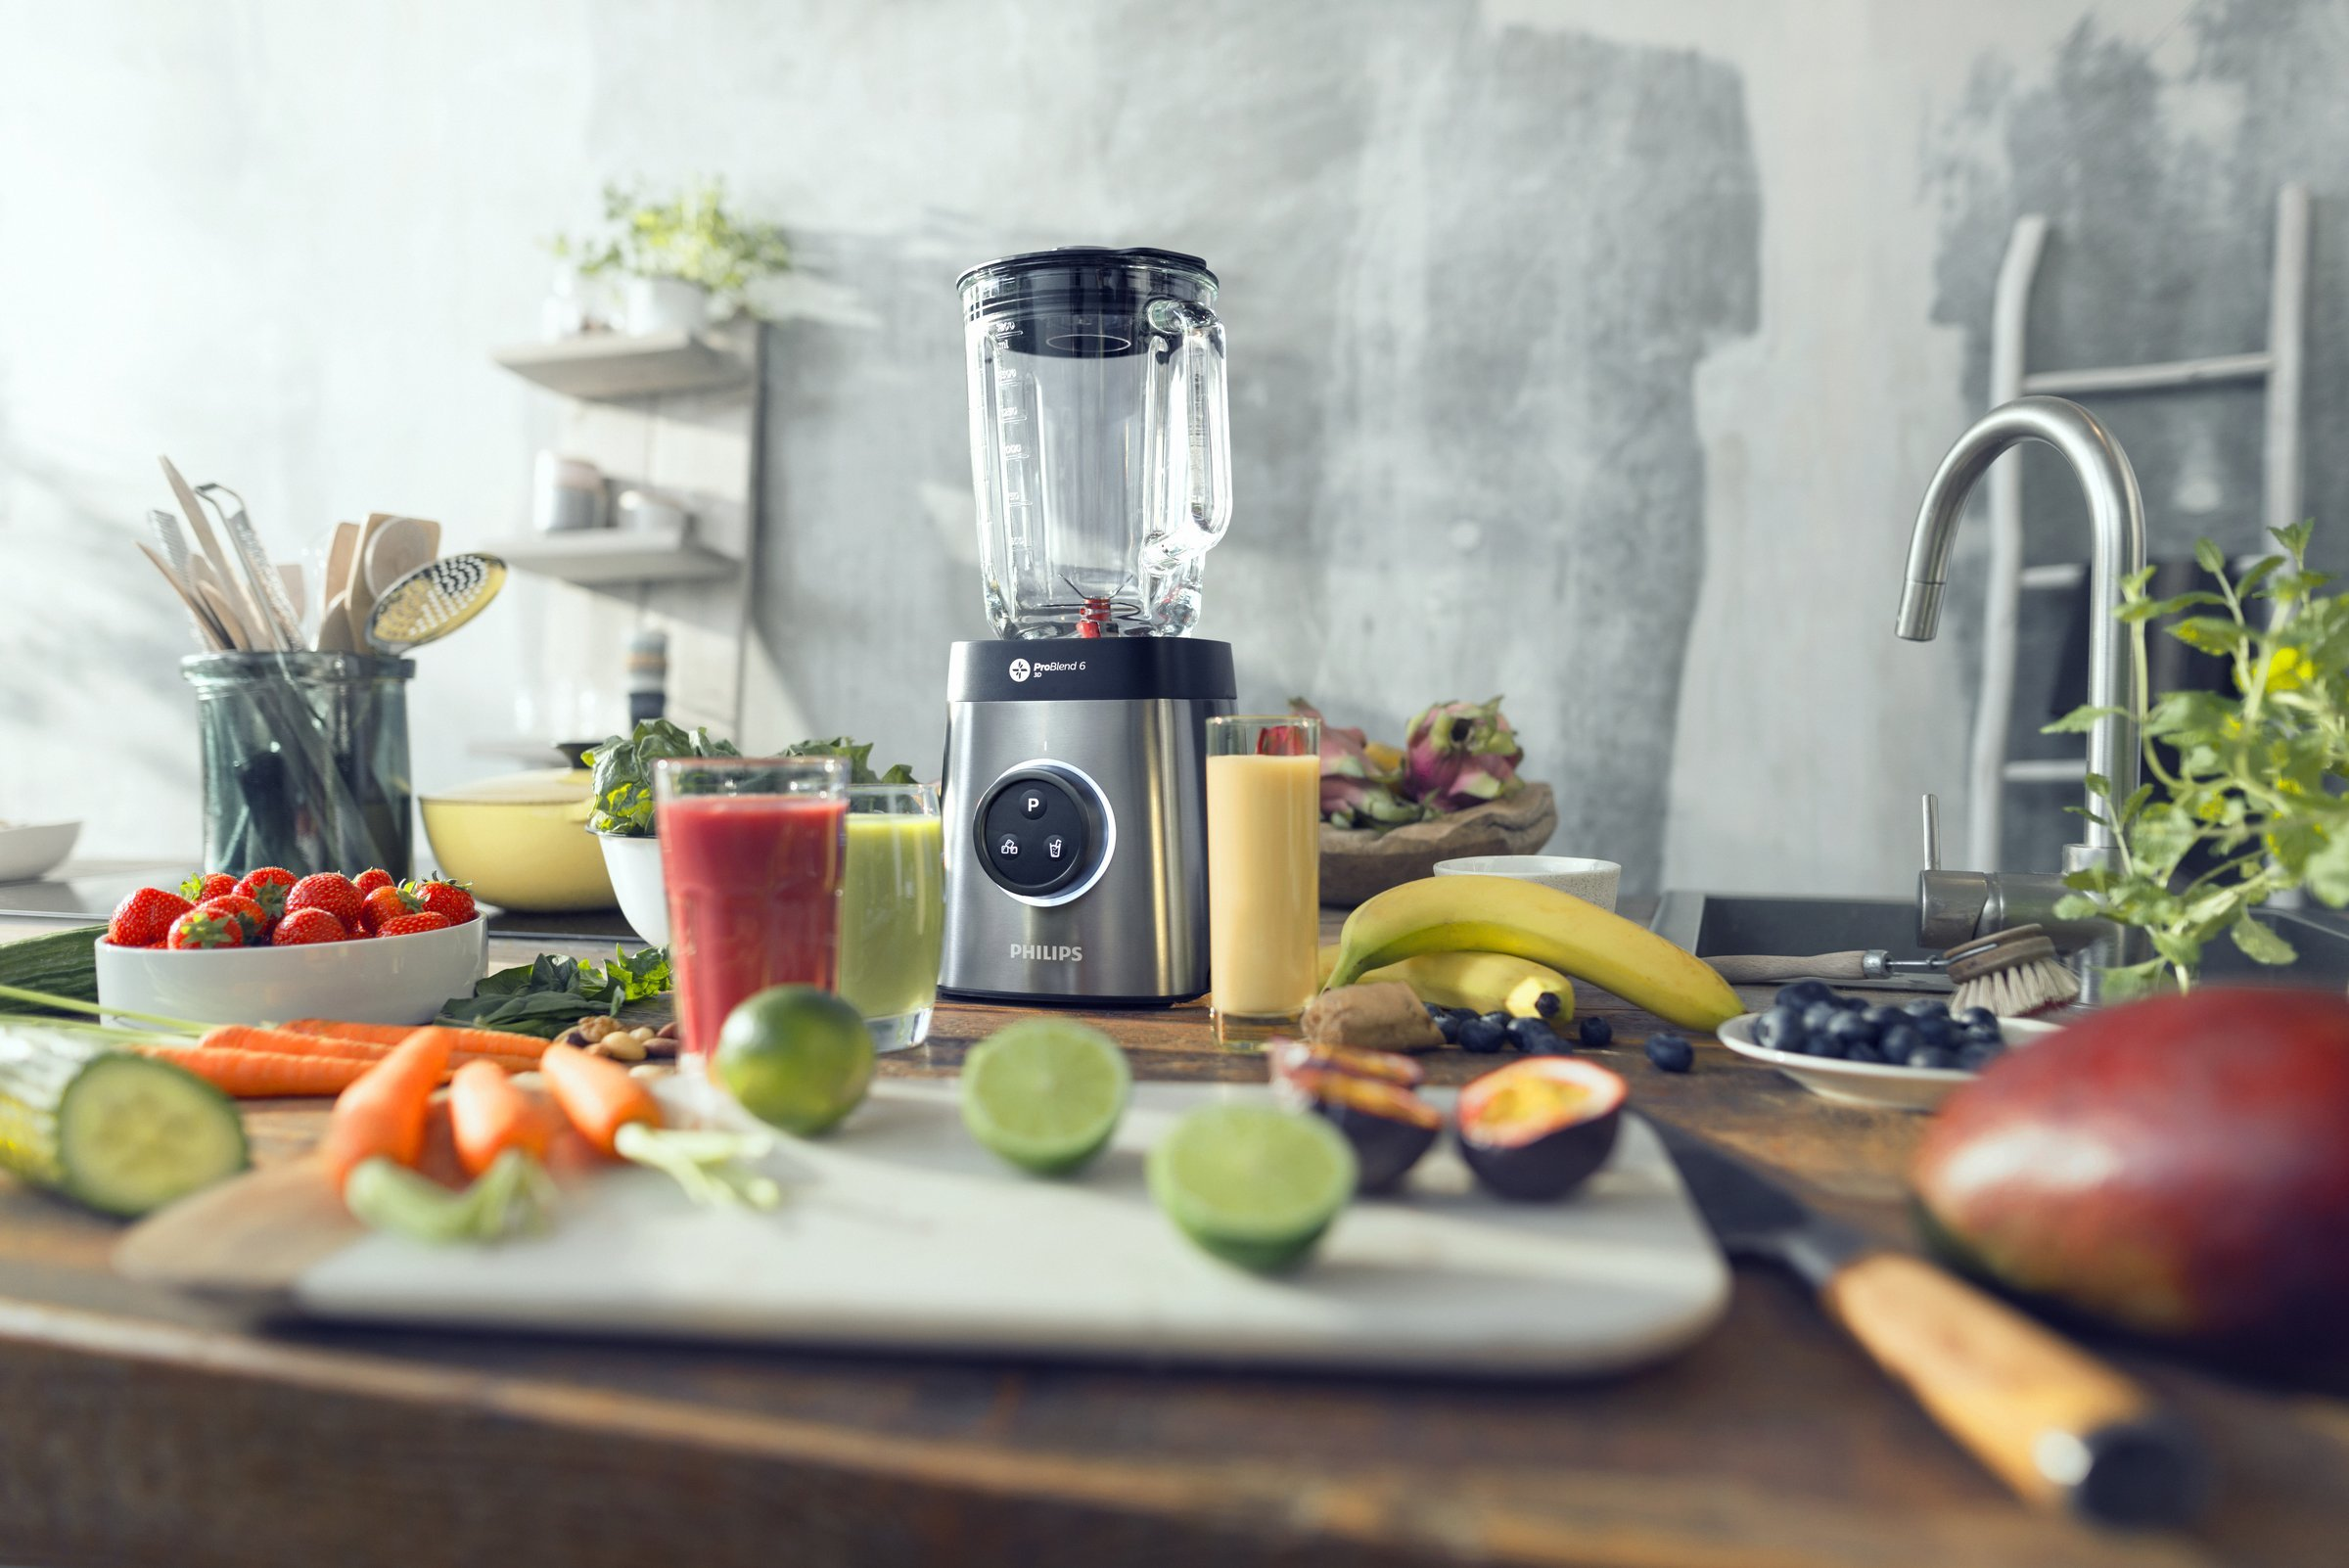 Philips-HR365500-Standmixer-1400-Watt-ProBlend-6-3D-Technologie-2-Liter-Glasbehlter-2x-Trinkbecher-Splmaschinenfest-edelstahl